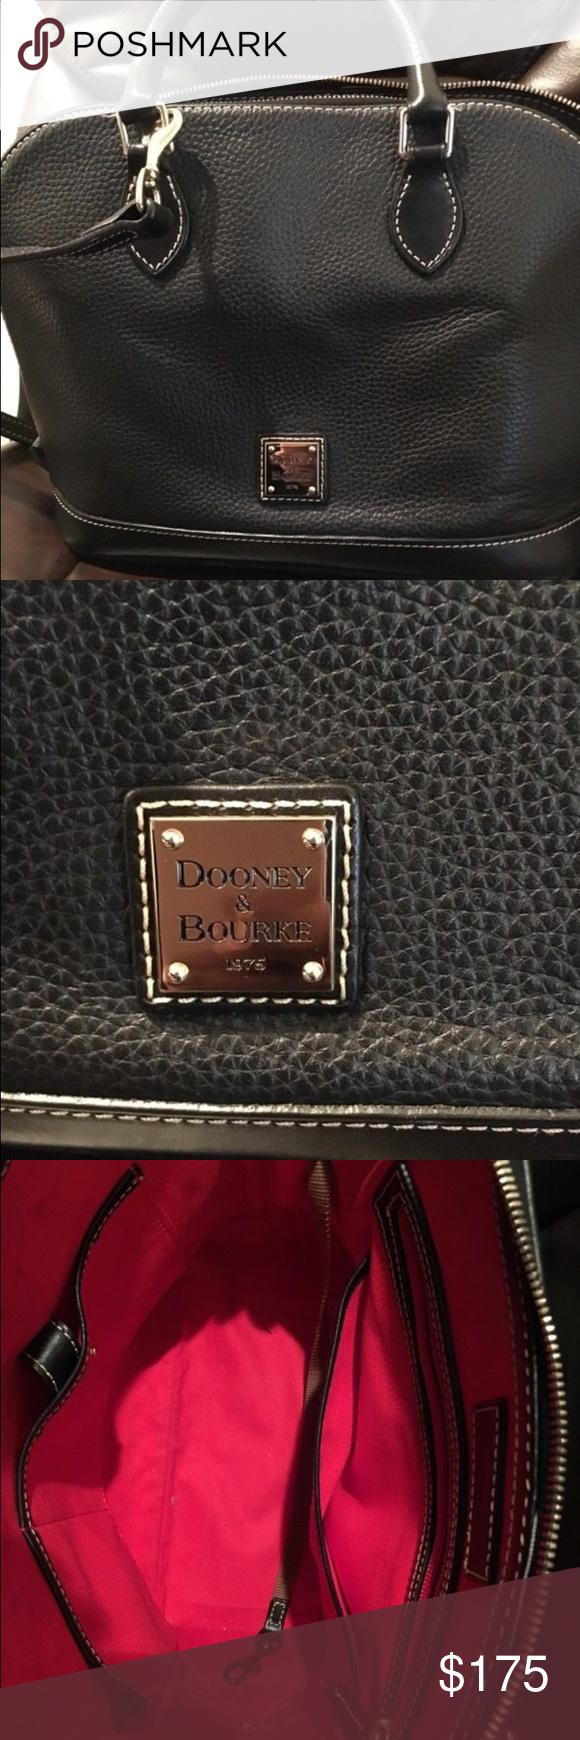 Dooney and Burke Bowling Bag style purse Black Dooney and Burke bowling bag style purse. Like new Dooney & Bourke Bags Shoulder Bags